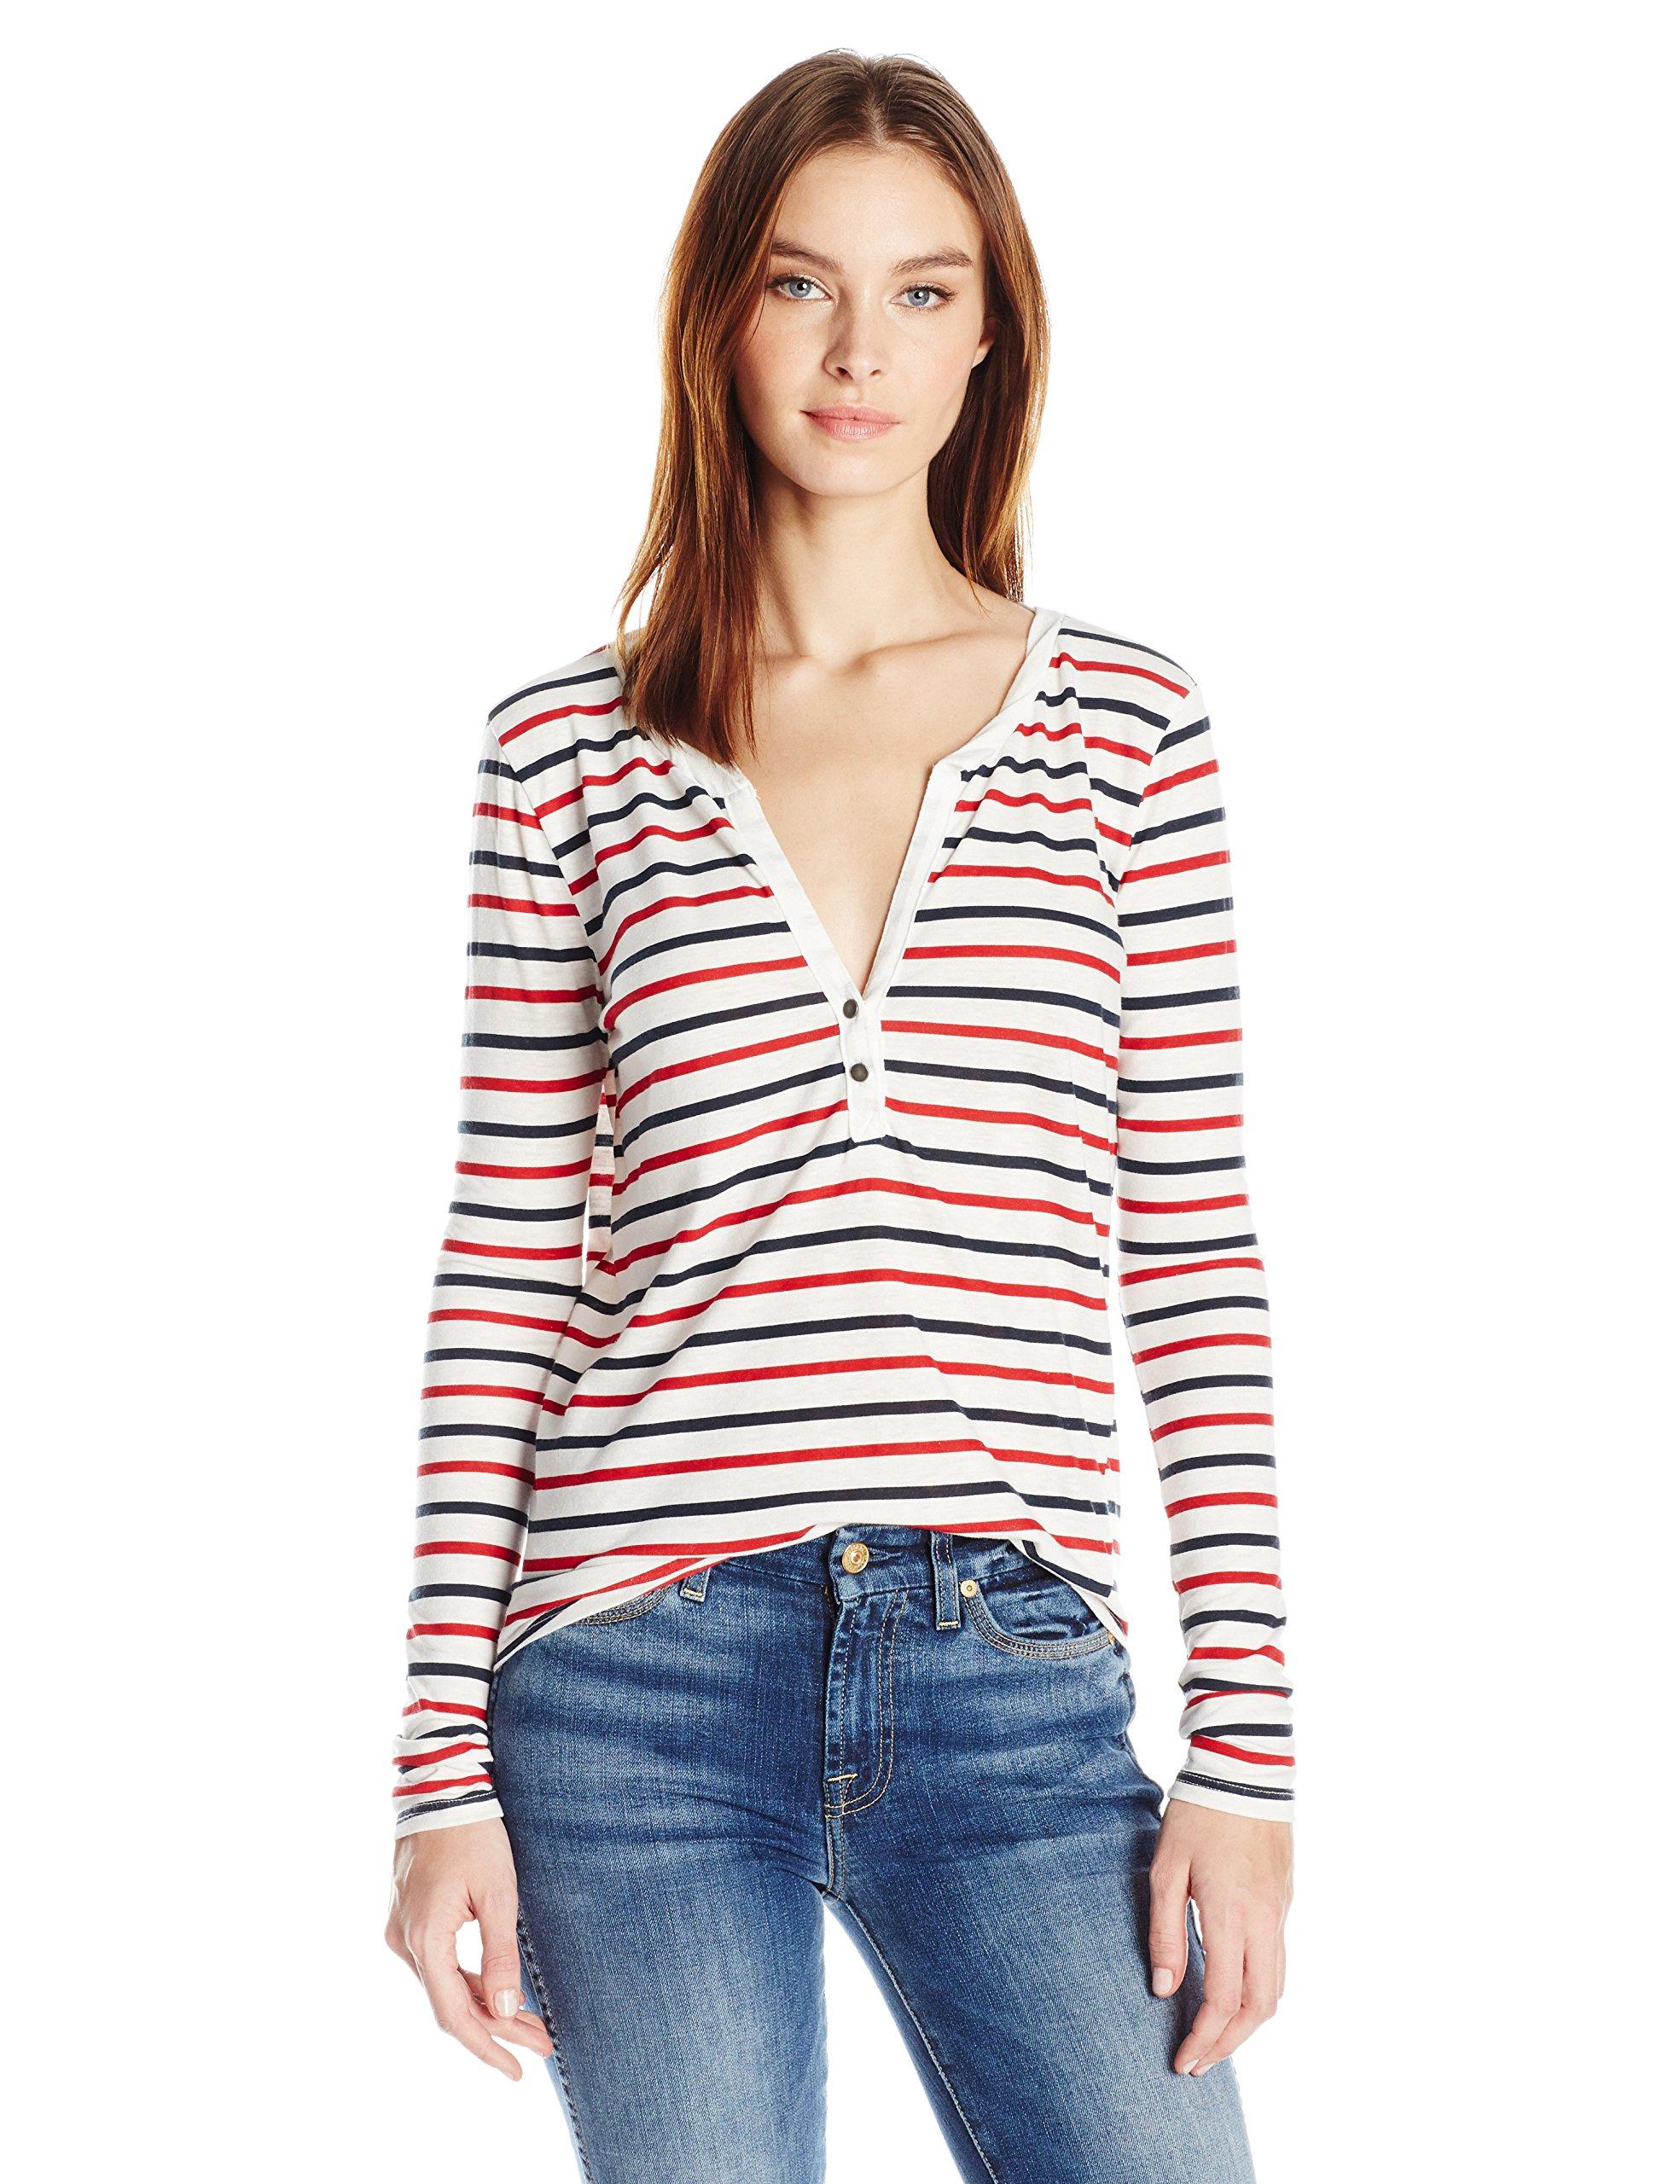 Pam & Gela Women's L/s Henley Tee, White/Red/Blue Stripe, L